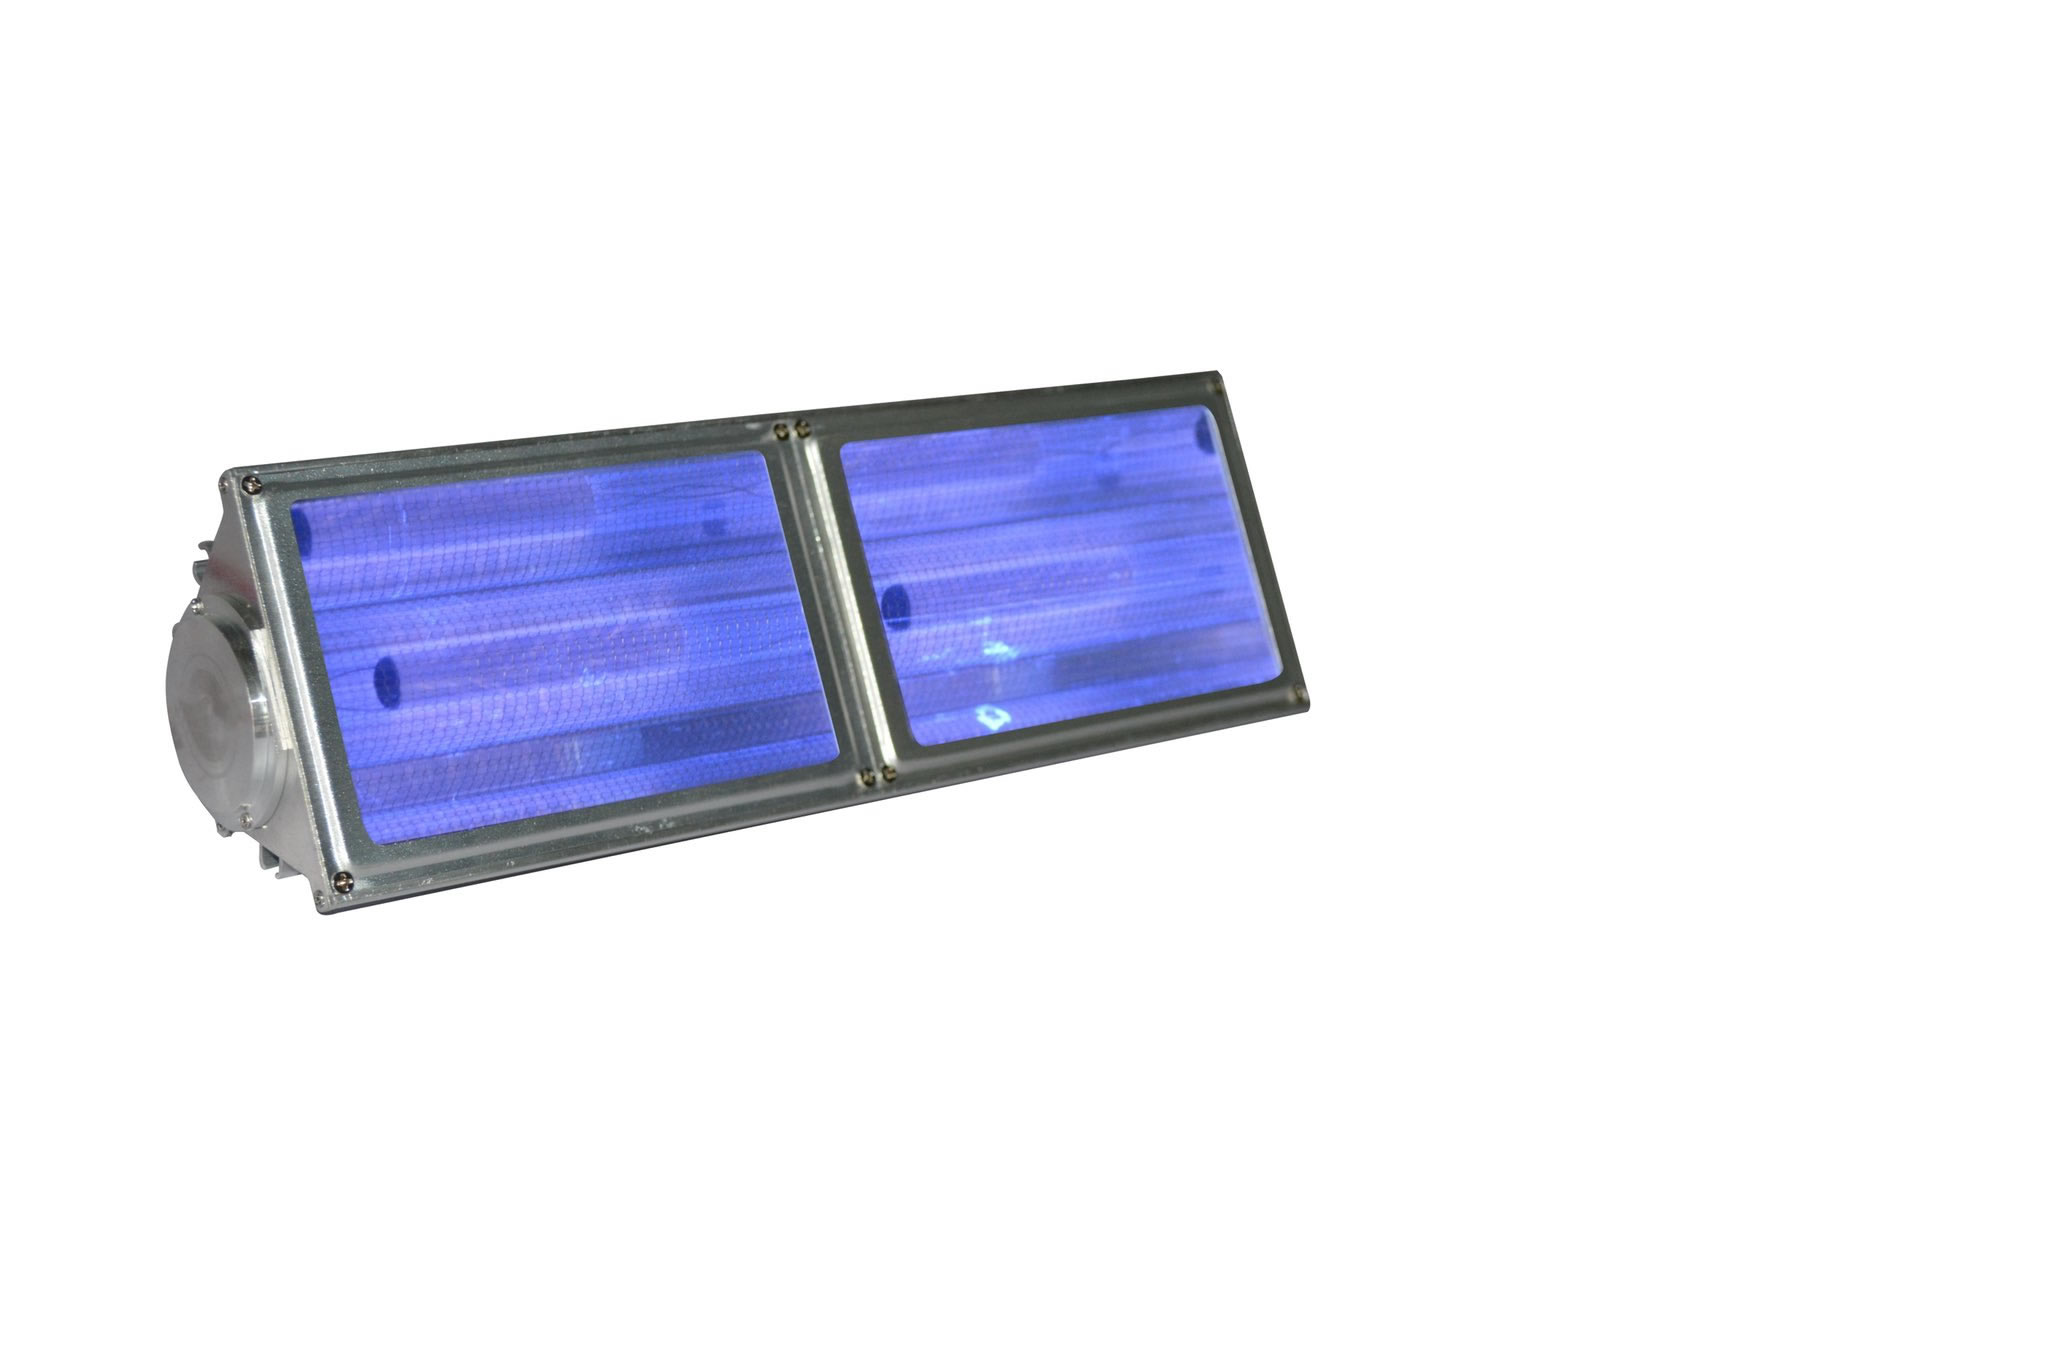 40w-krcl-excimer-module-filtered-222nm-peak-far-uvc-ap-uvgi